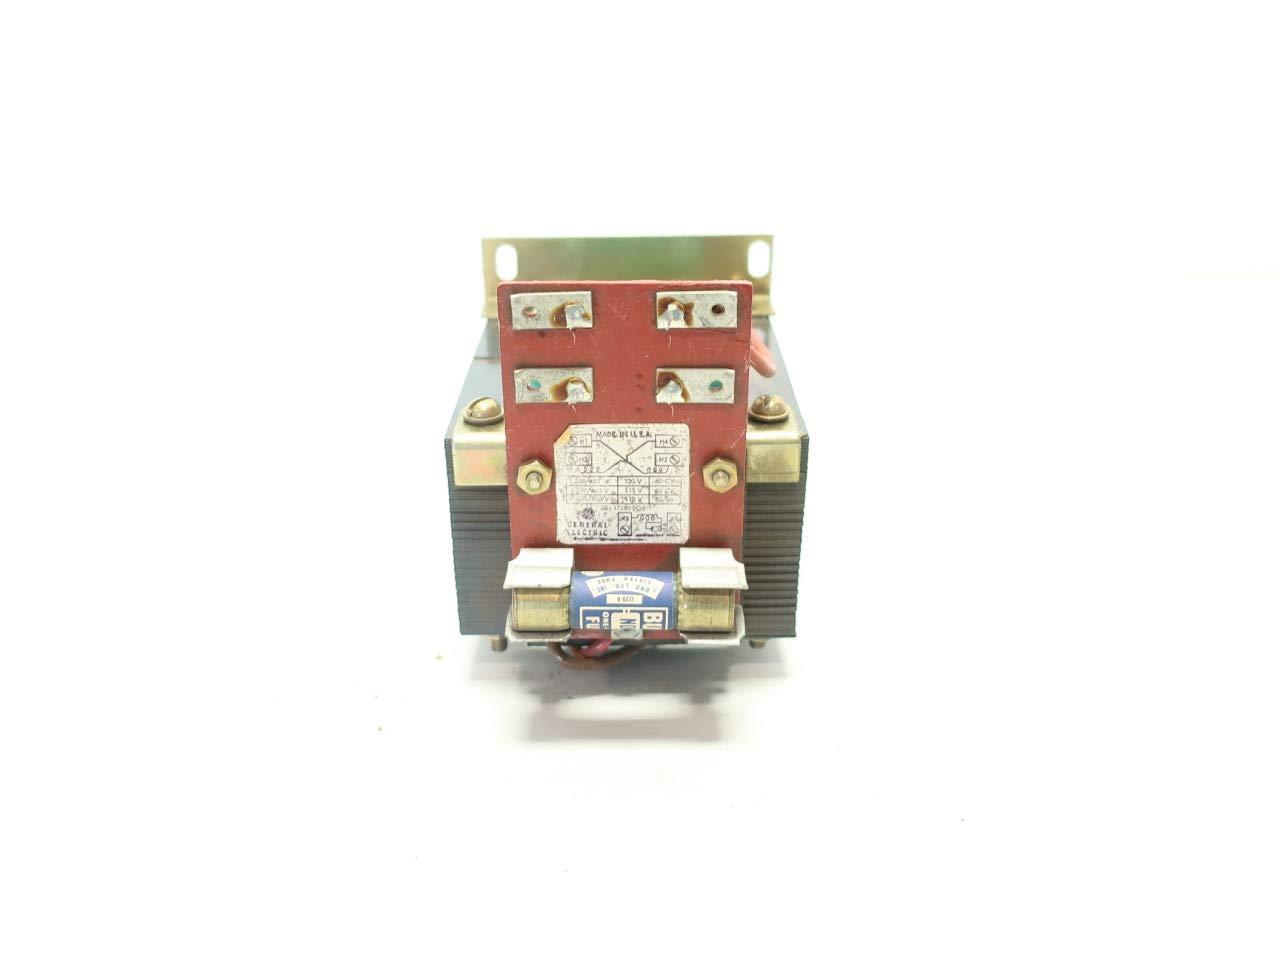 GE CR208XT304A 55-172809G8 1PH 240//480V-AC 120V-AC Transformer R691146